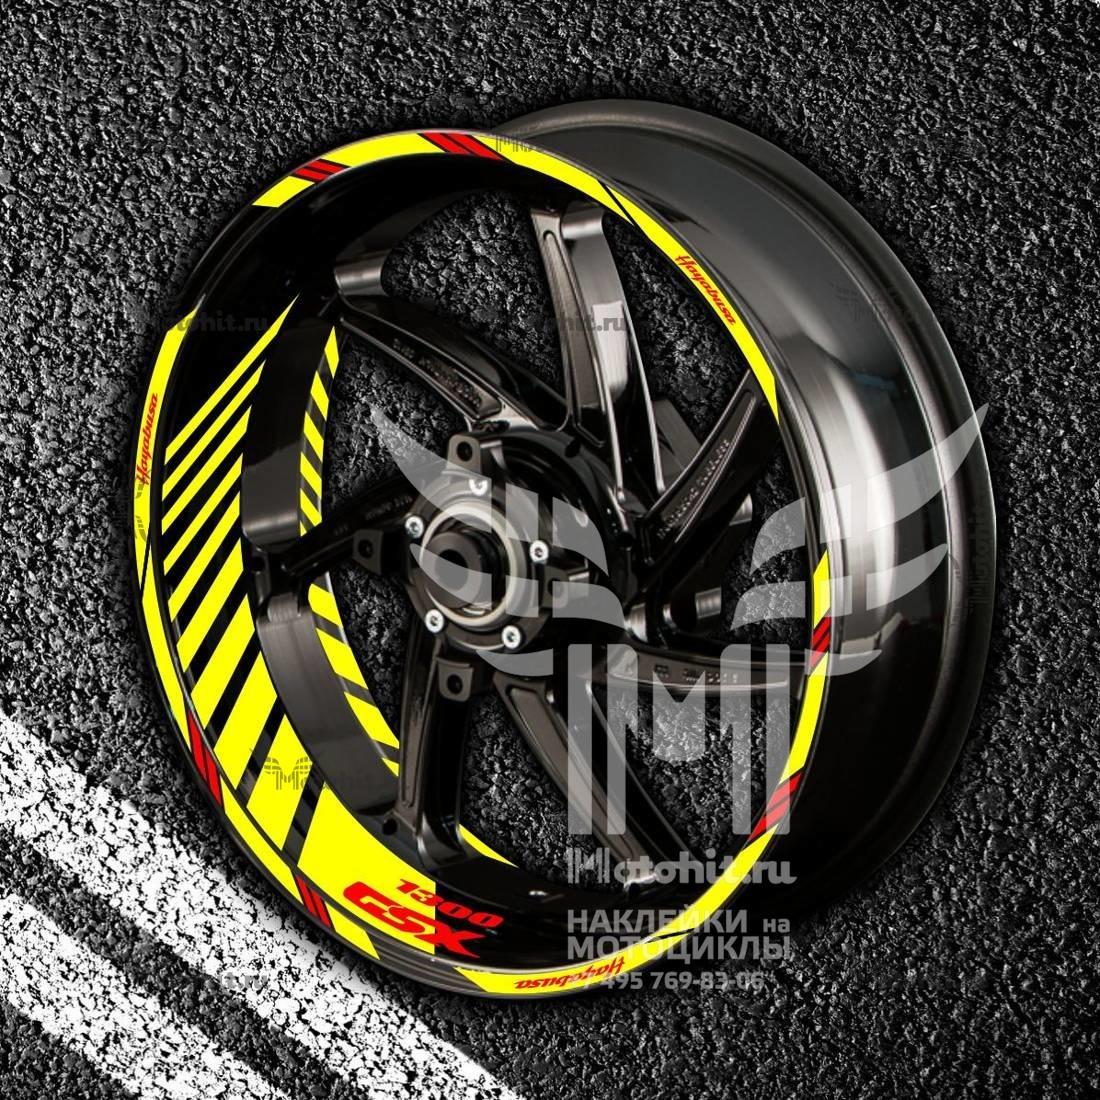 Комплект наклеек с полосами на колеса мотоцикла SUZUKI 1000-GSX